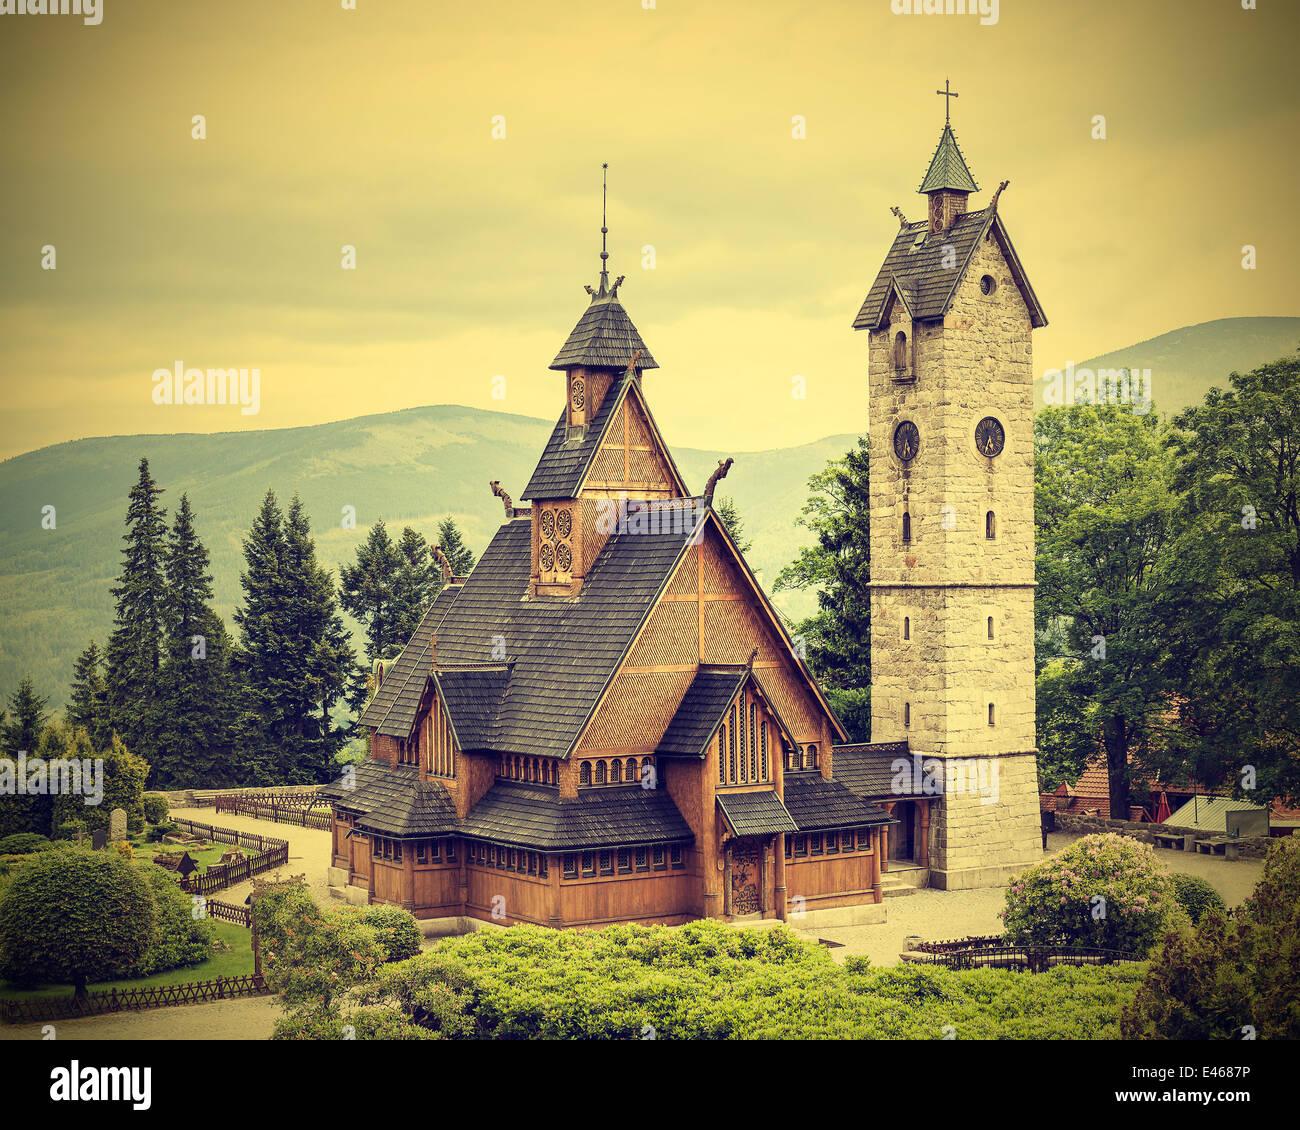 Vecchio, legno, tempio Wang in Karpacz, Polonia, in stile vintage. Immagini Stock